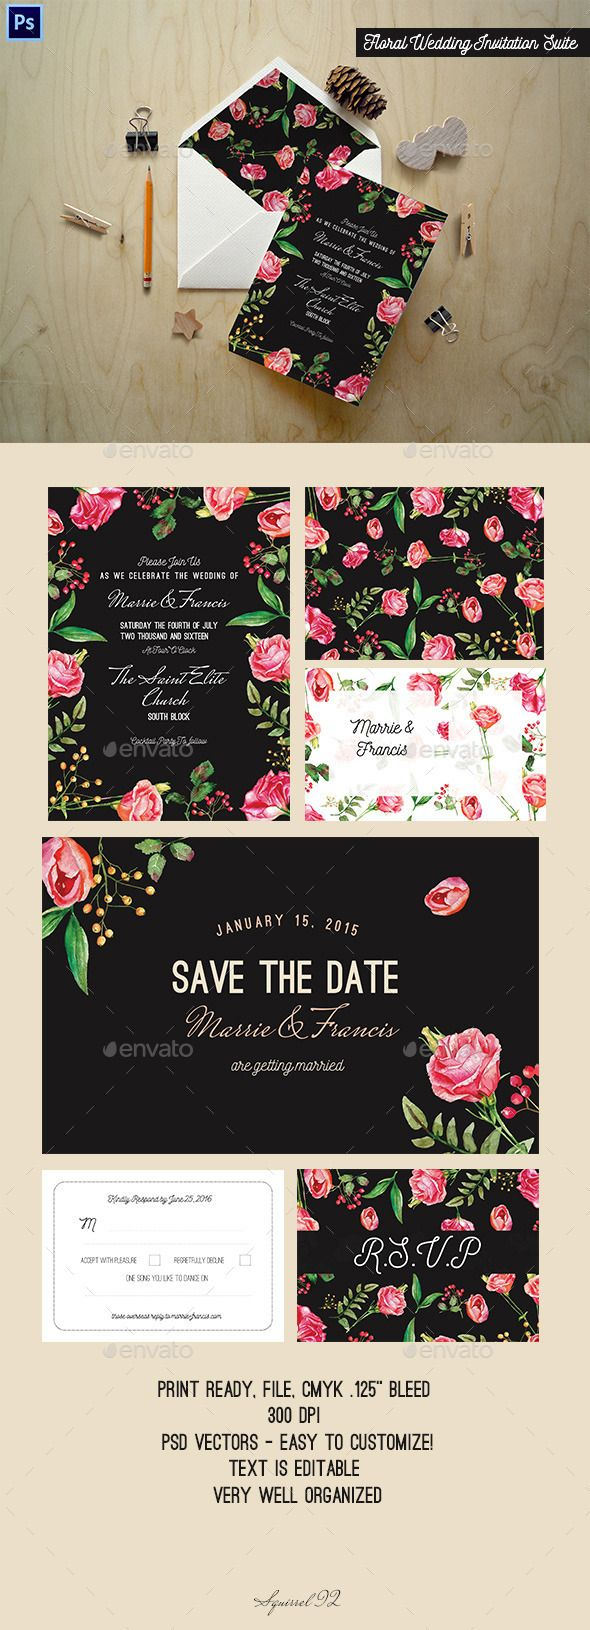 wedding invitation design psd%0A Floral Wedding Invitation Suite